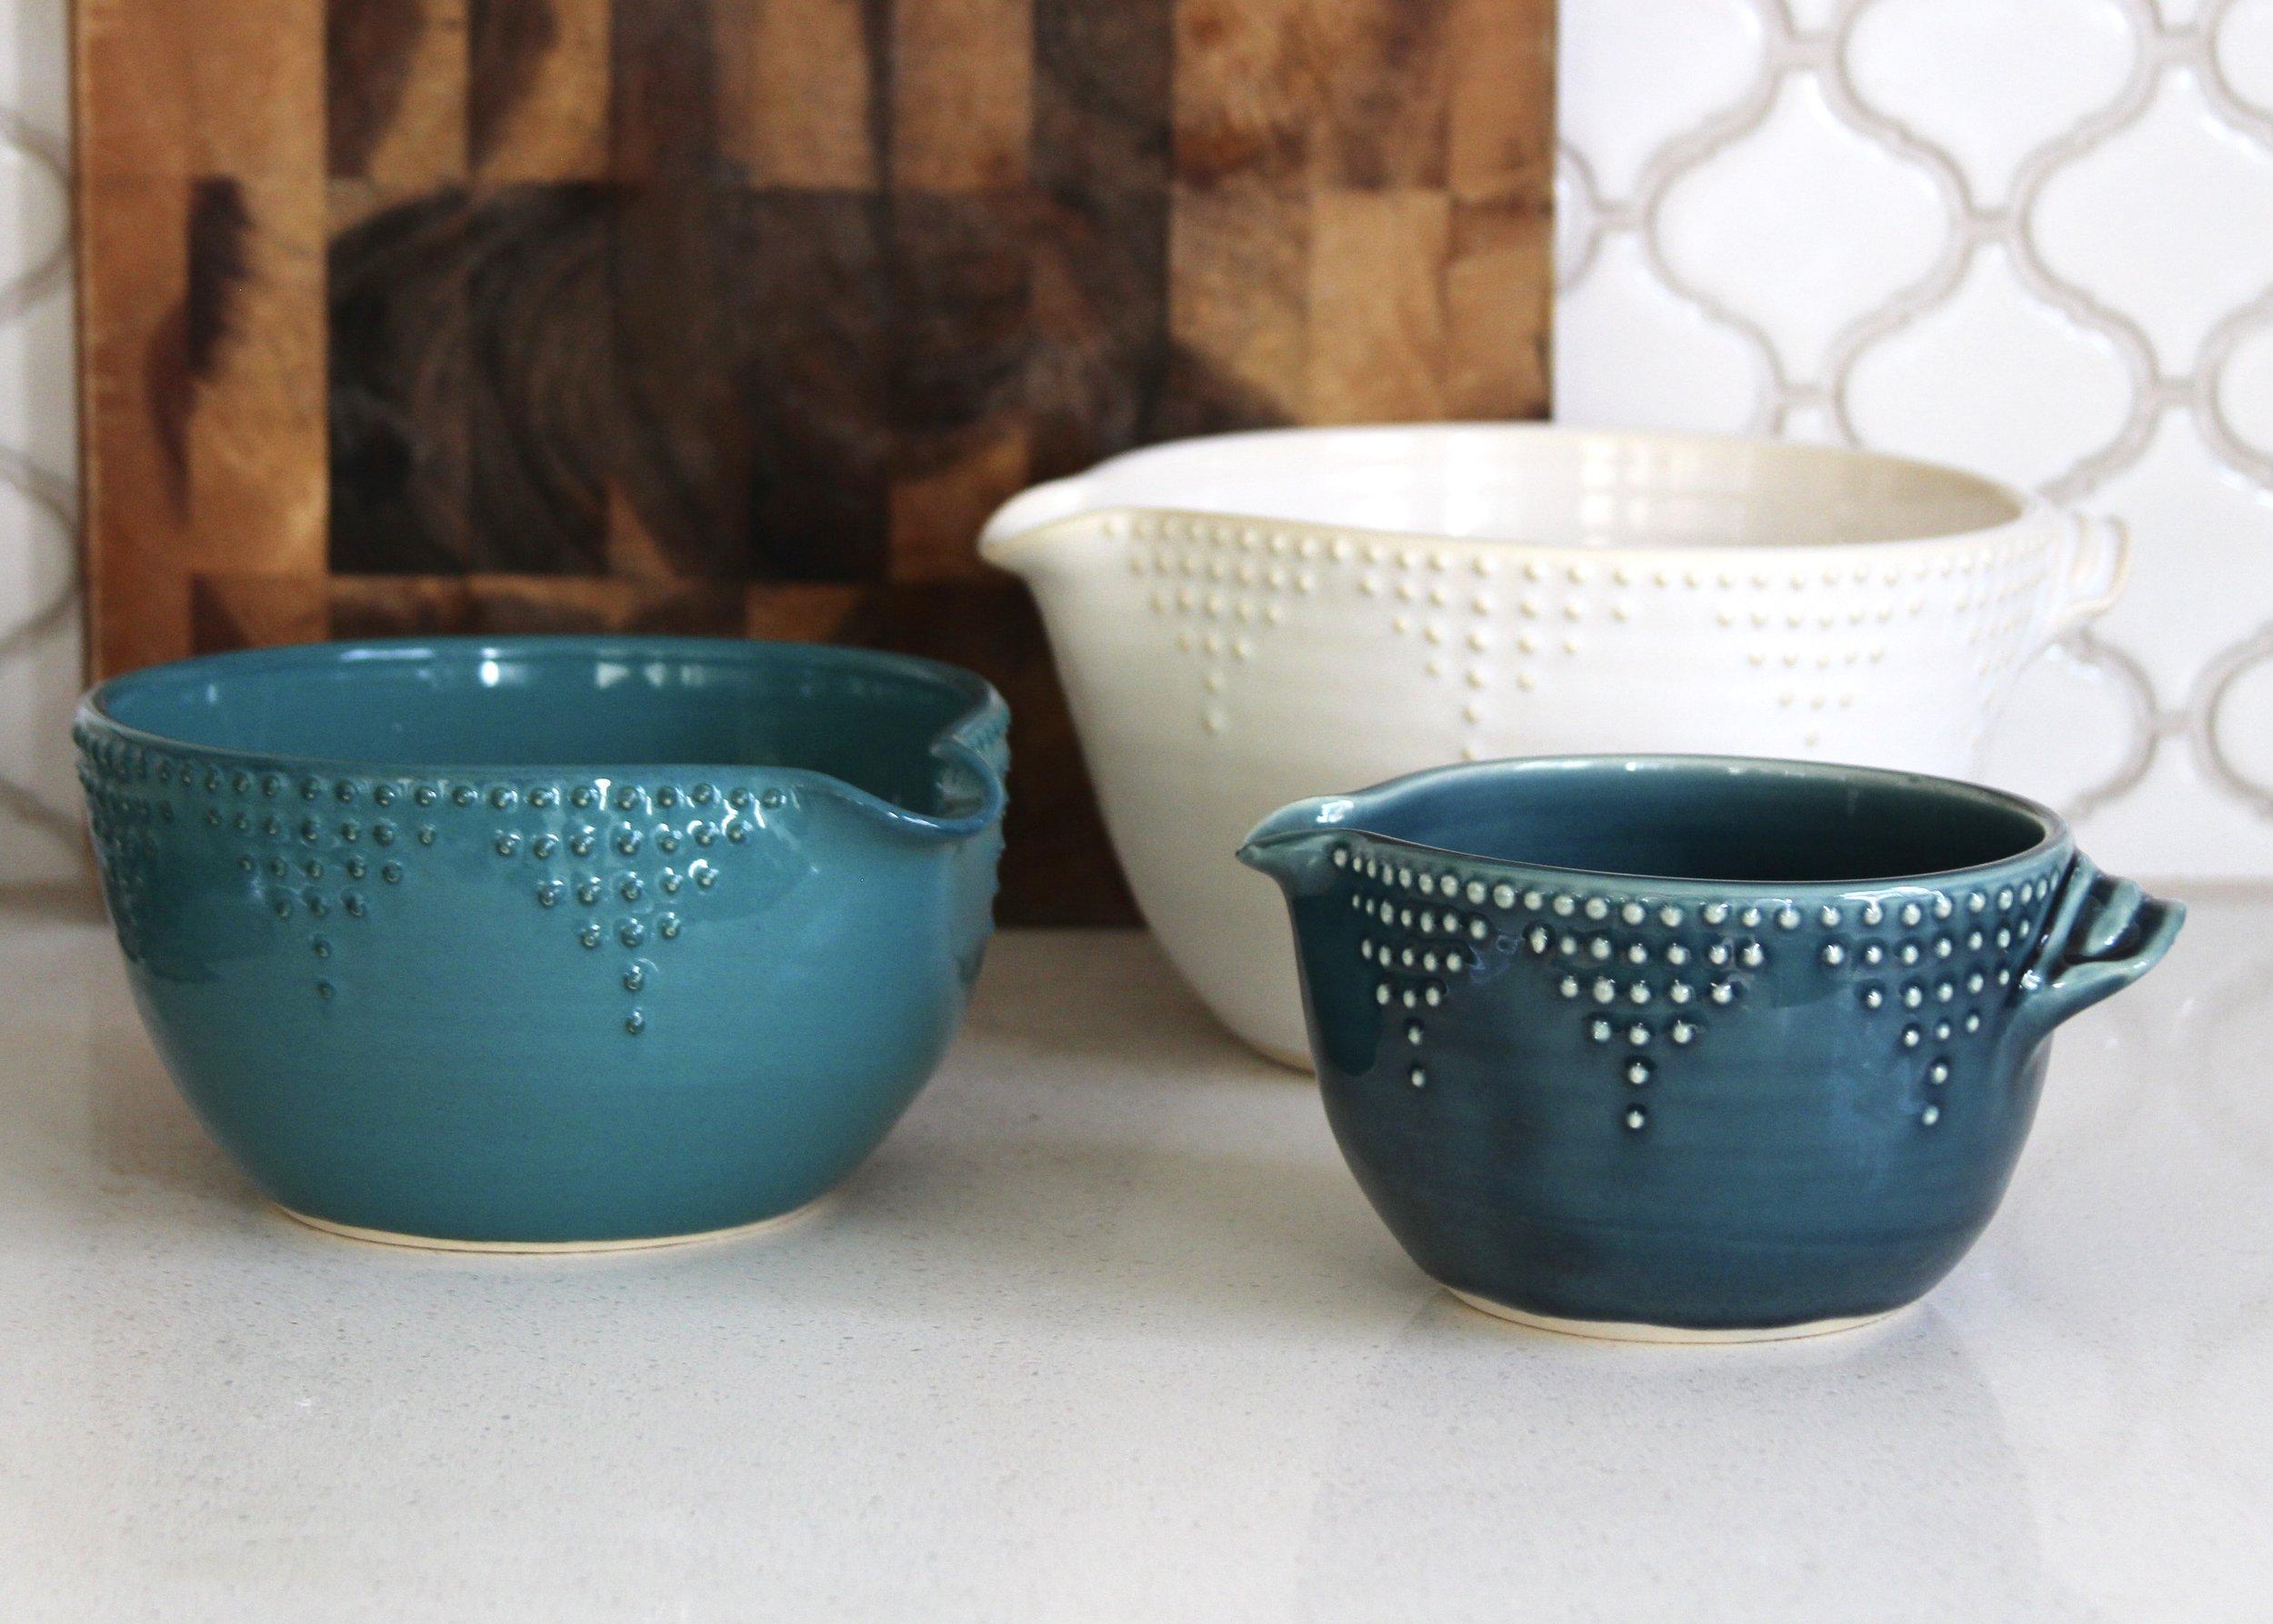 Batter Bowls in Large, Medium & Small